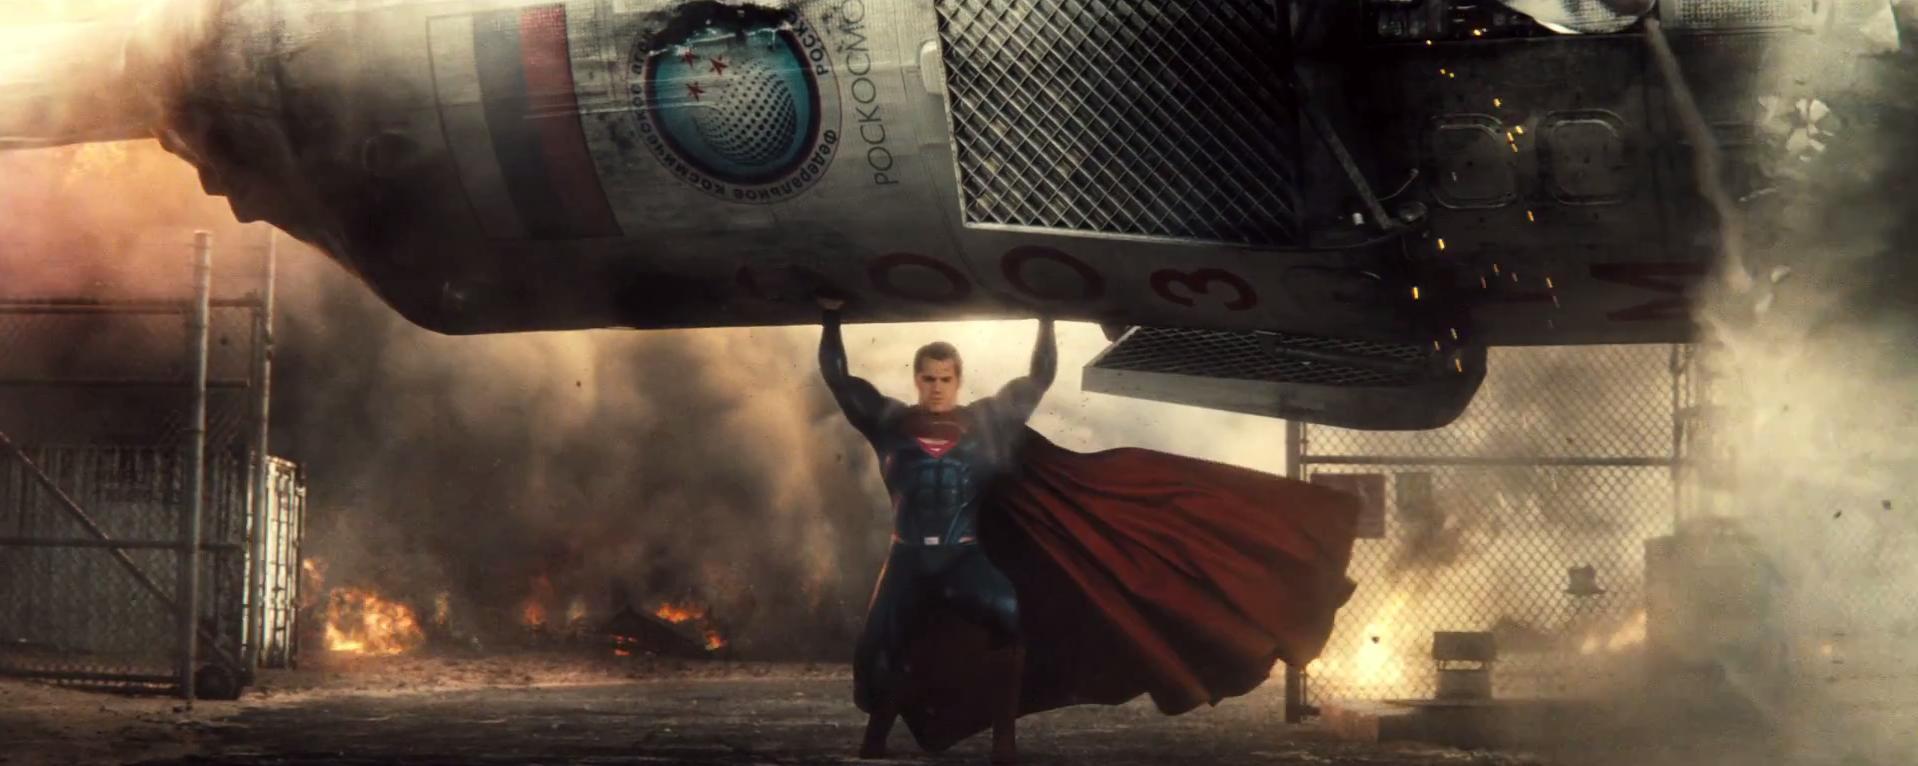 Superman lifting heavy things.